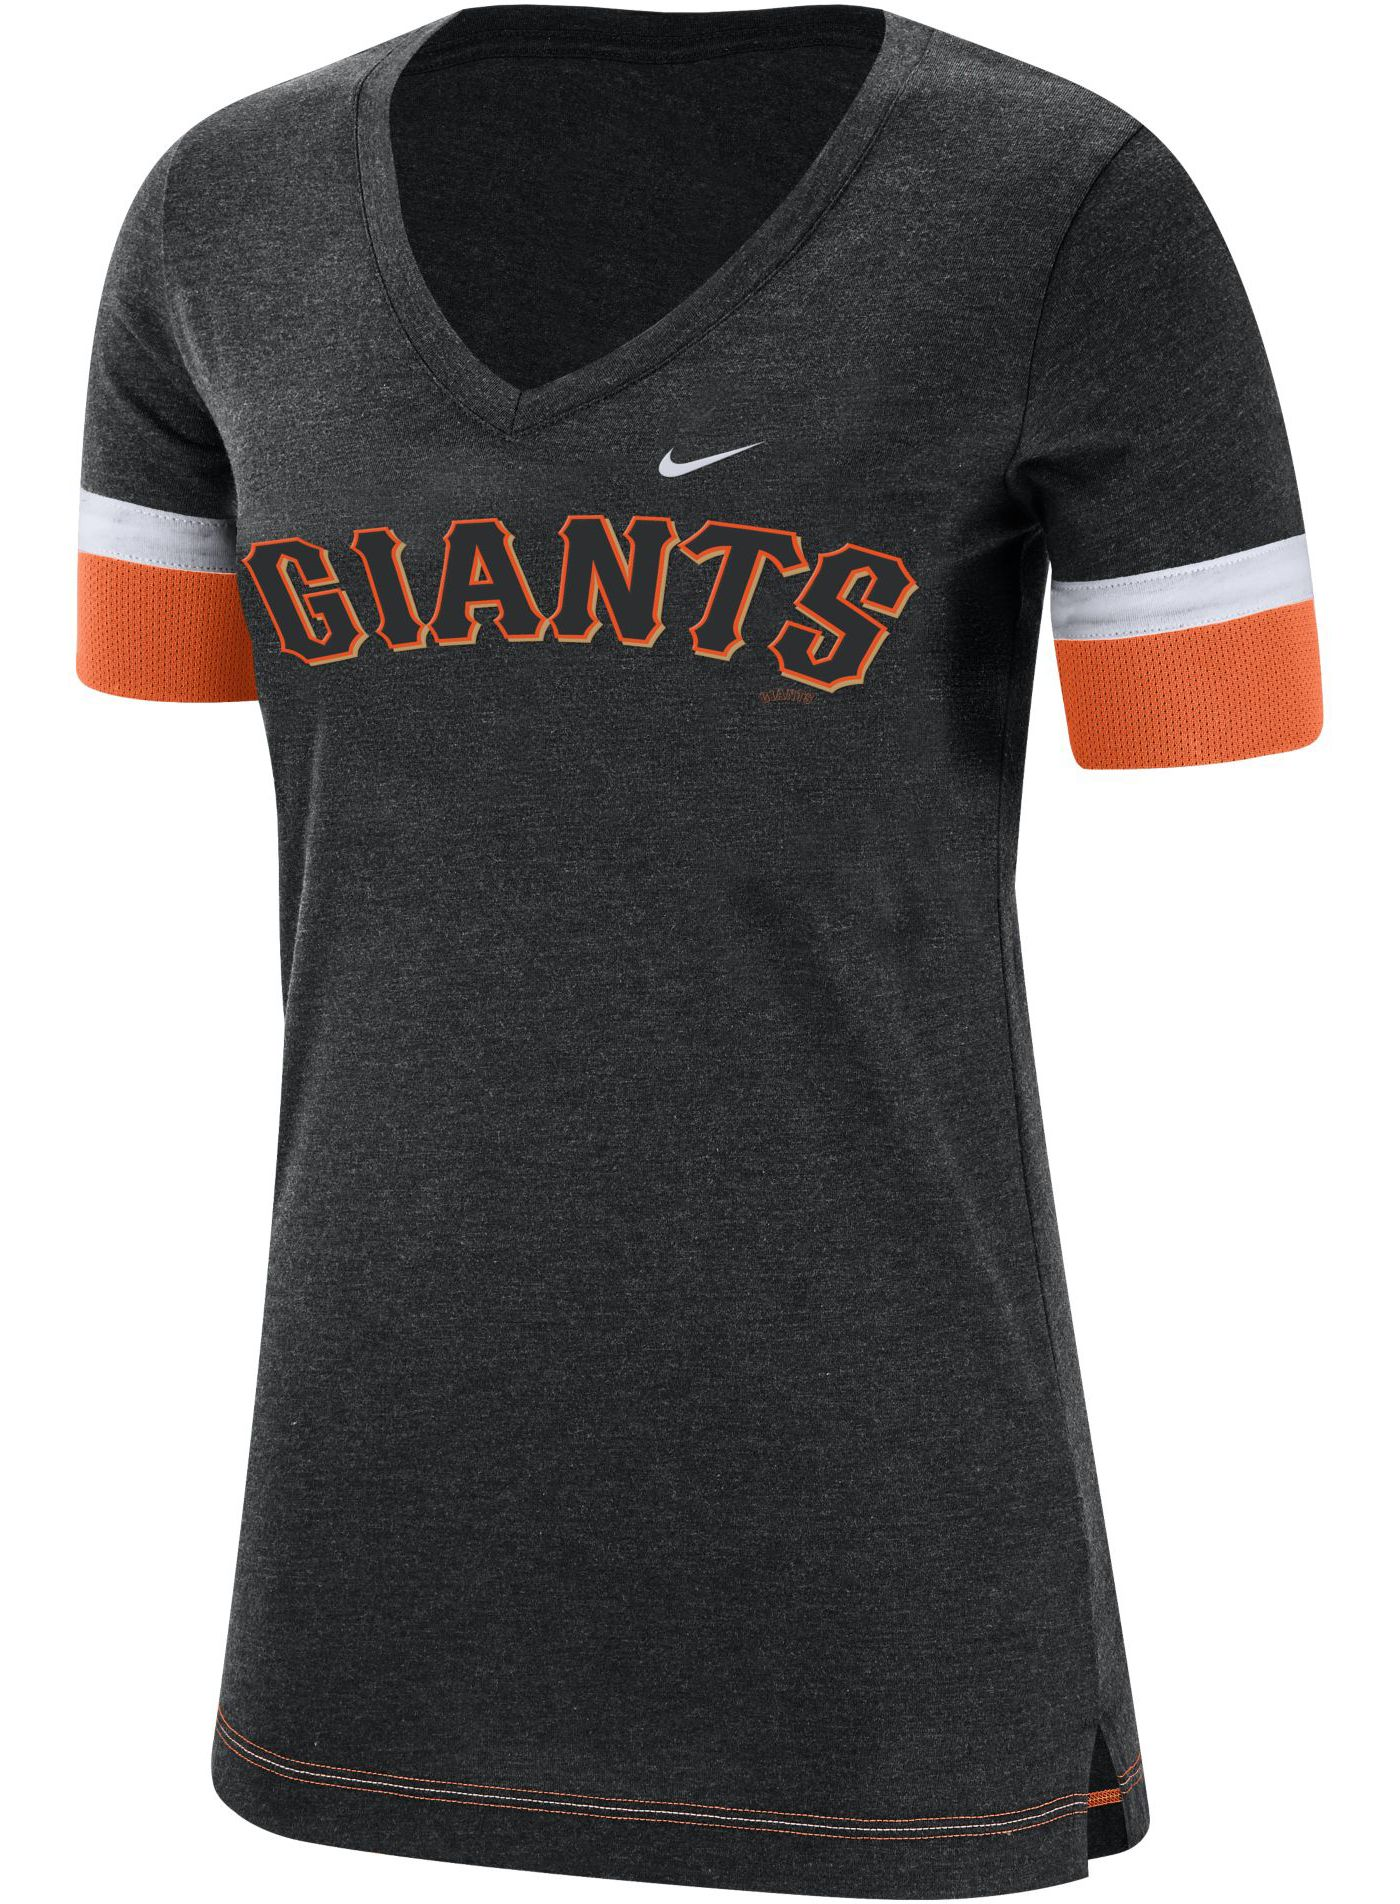 Nike Women's San Francisco Giants Dri-FIT V-Neck T-Shirt